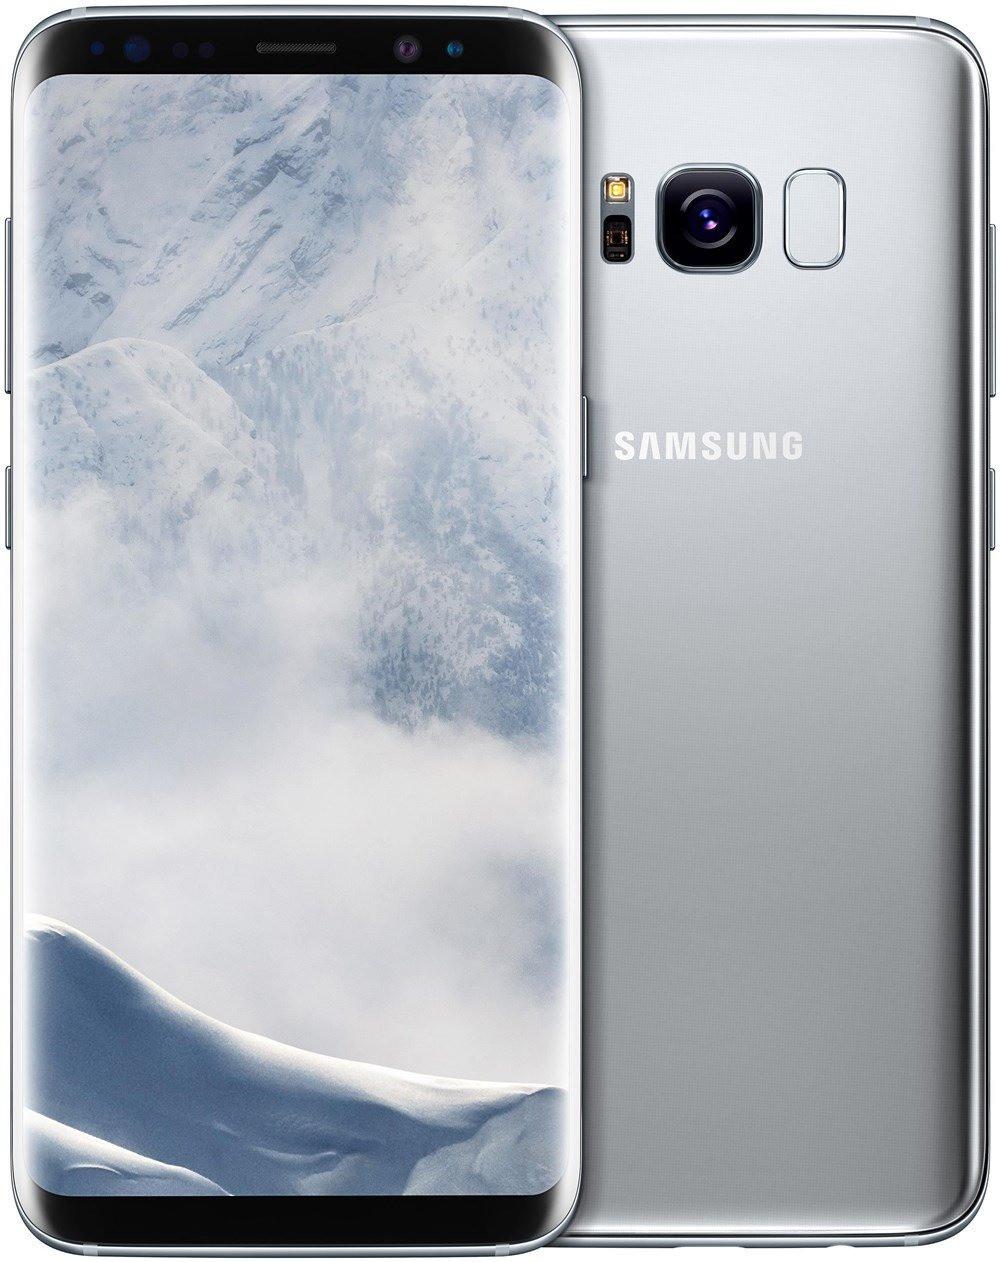 "Smartphone 5.8"" Samsung Galaxy S8 - QHD+, Exynos 8895, 4 Go de RAM, 64 Go, argent"